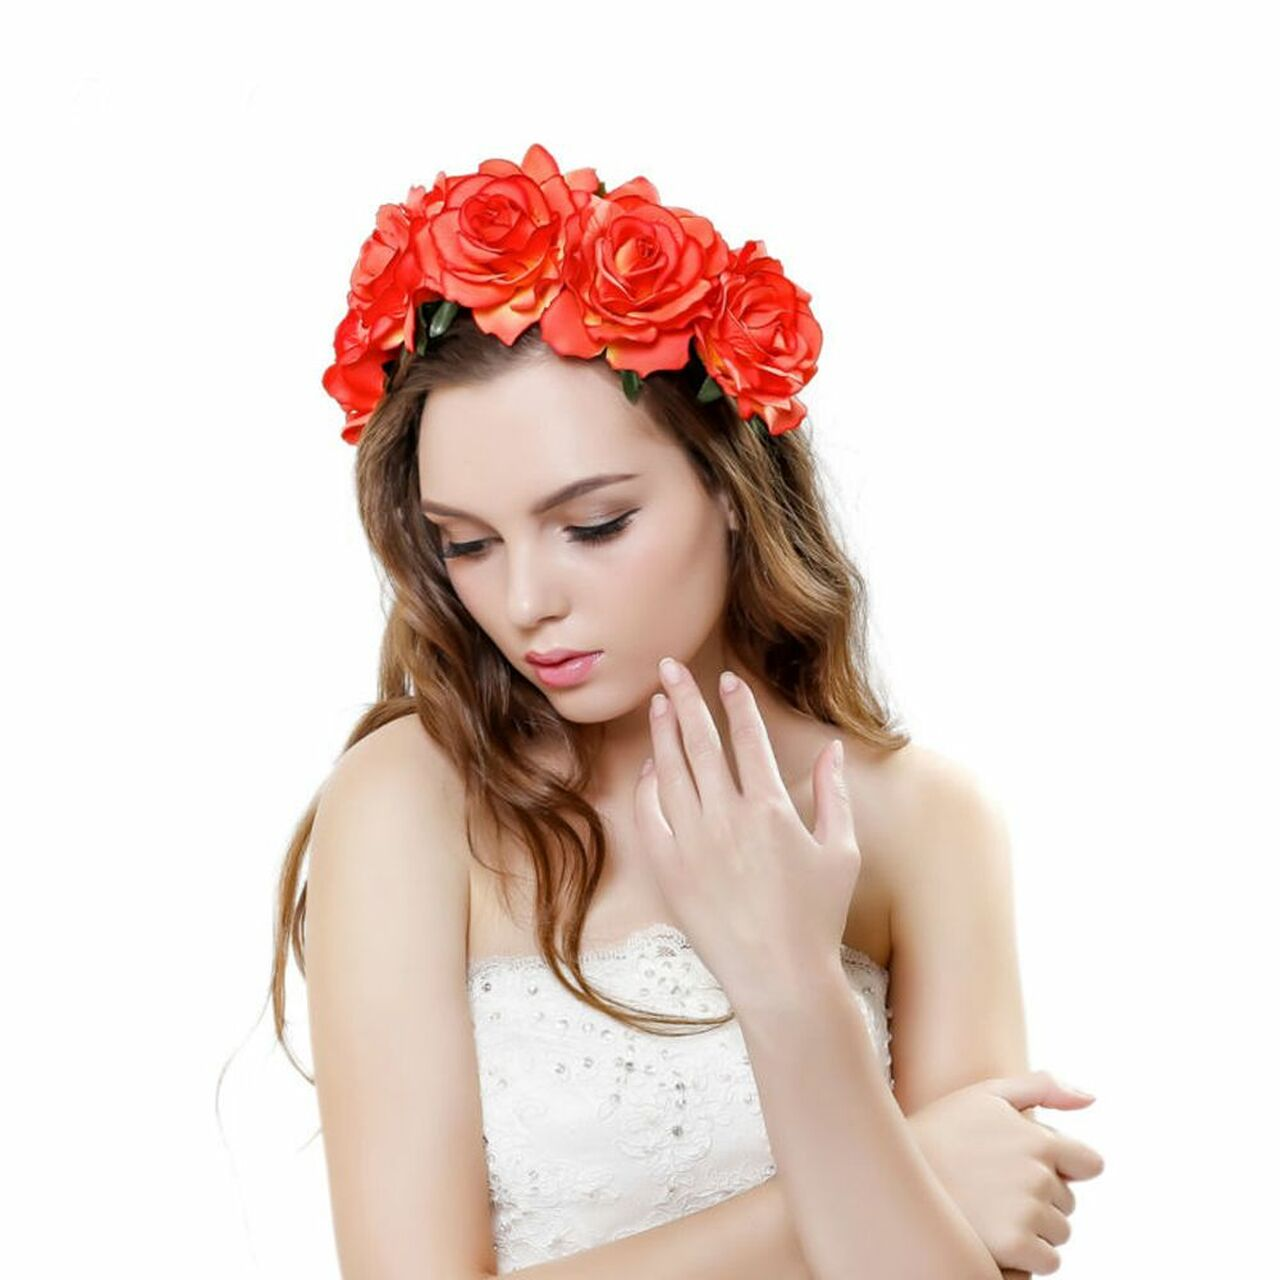 241731e23d4 ... 2018 New Spring Fashion Women Lady girls Wedding Flower Wreath Crown  Headband Floral Garlands Hair band ...